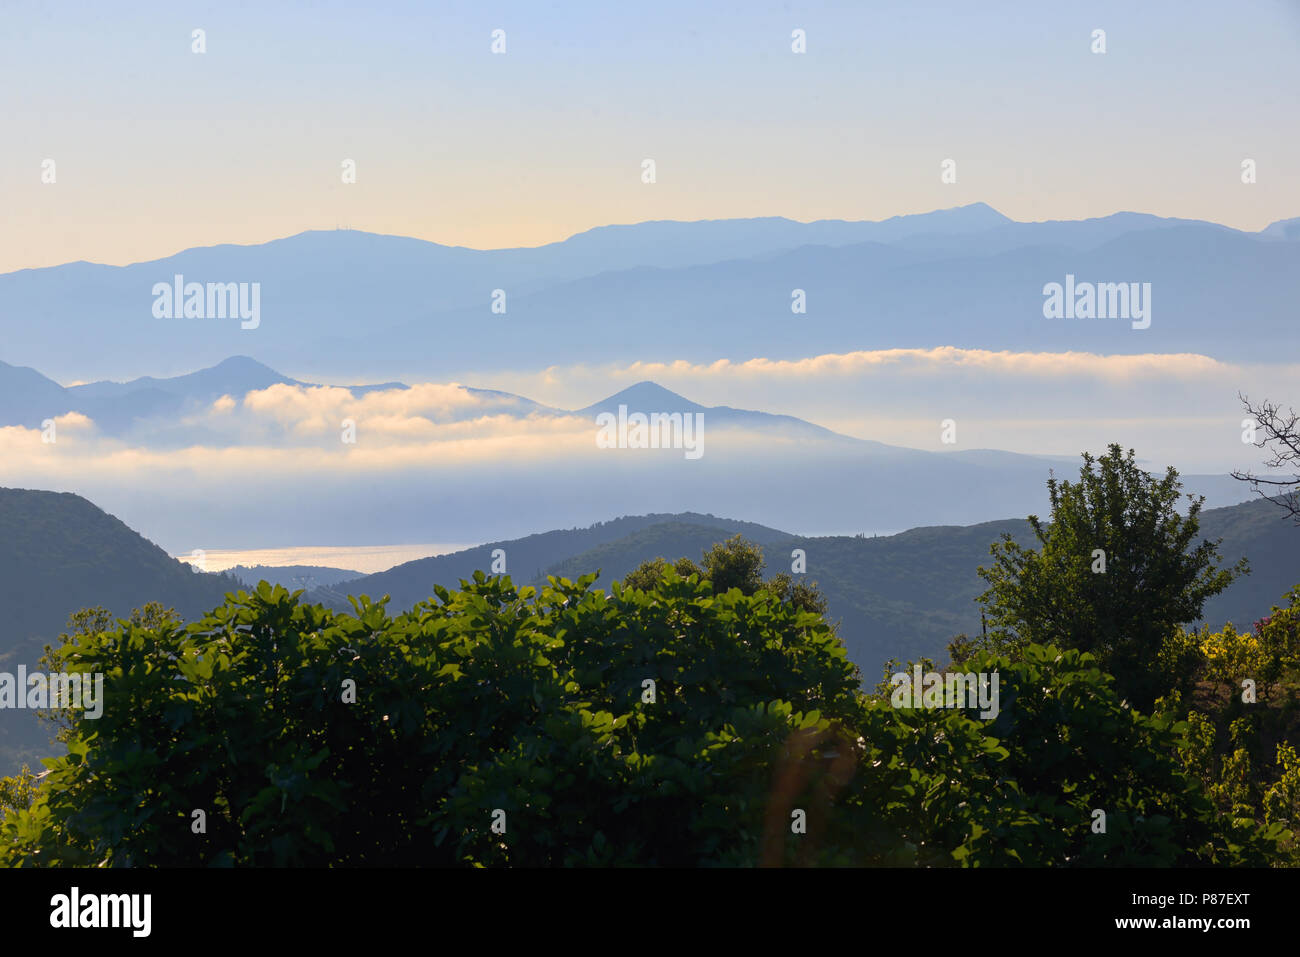 Small islands in the Ionian sea in Lefkada, Greece - Stock Image